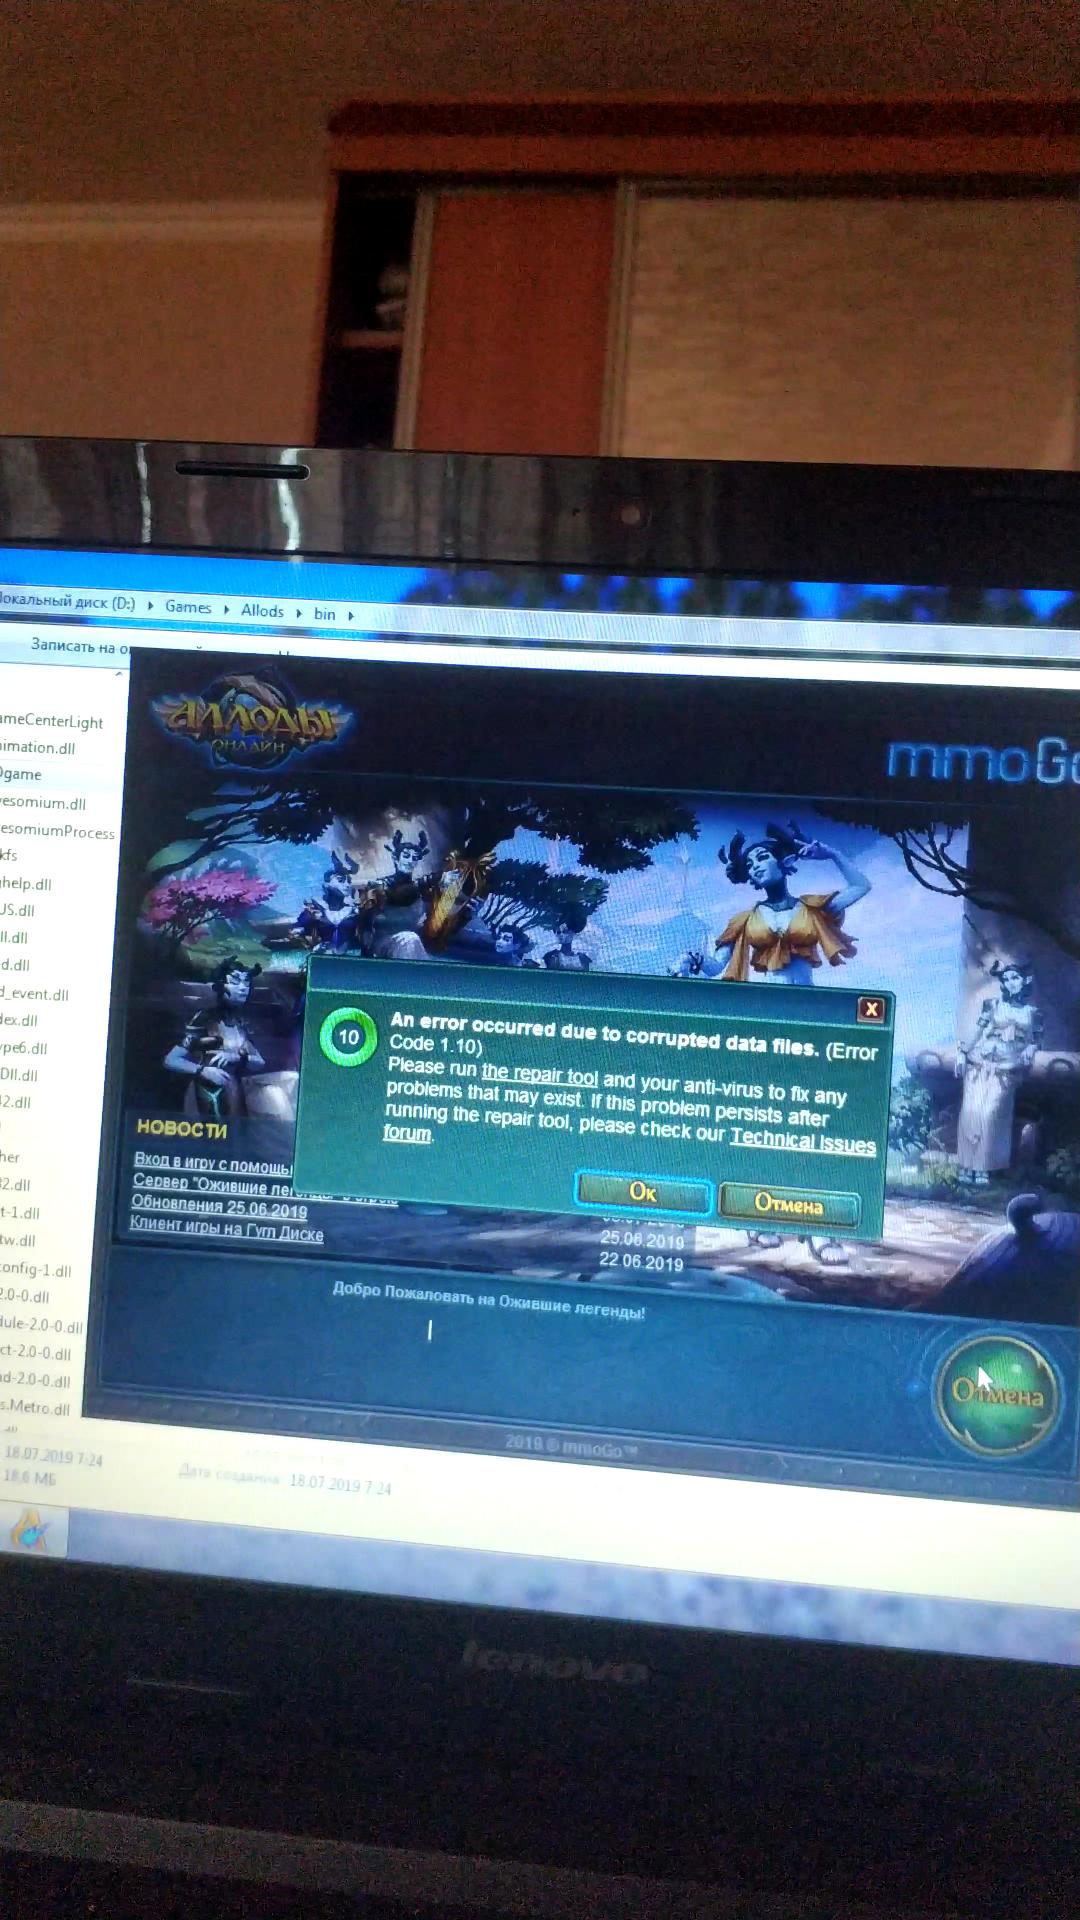 Screenshot_2019-07-18-12-20-51-577_com.miui.videoplayer.png